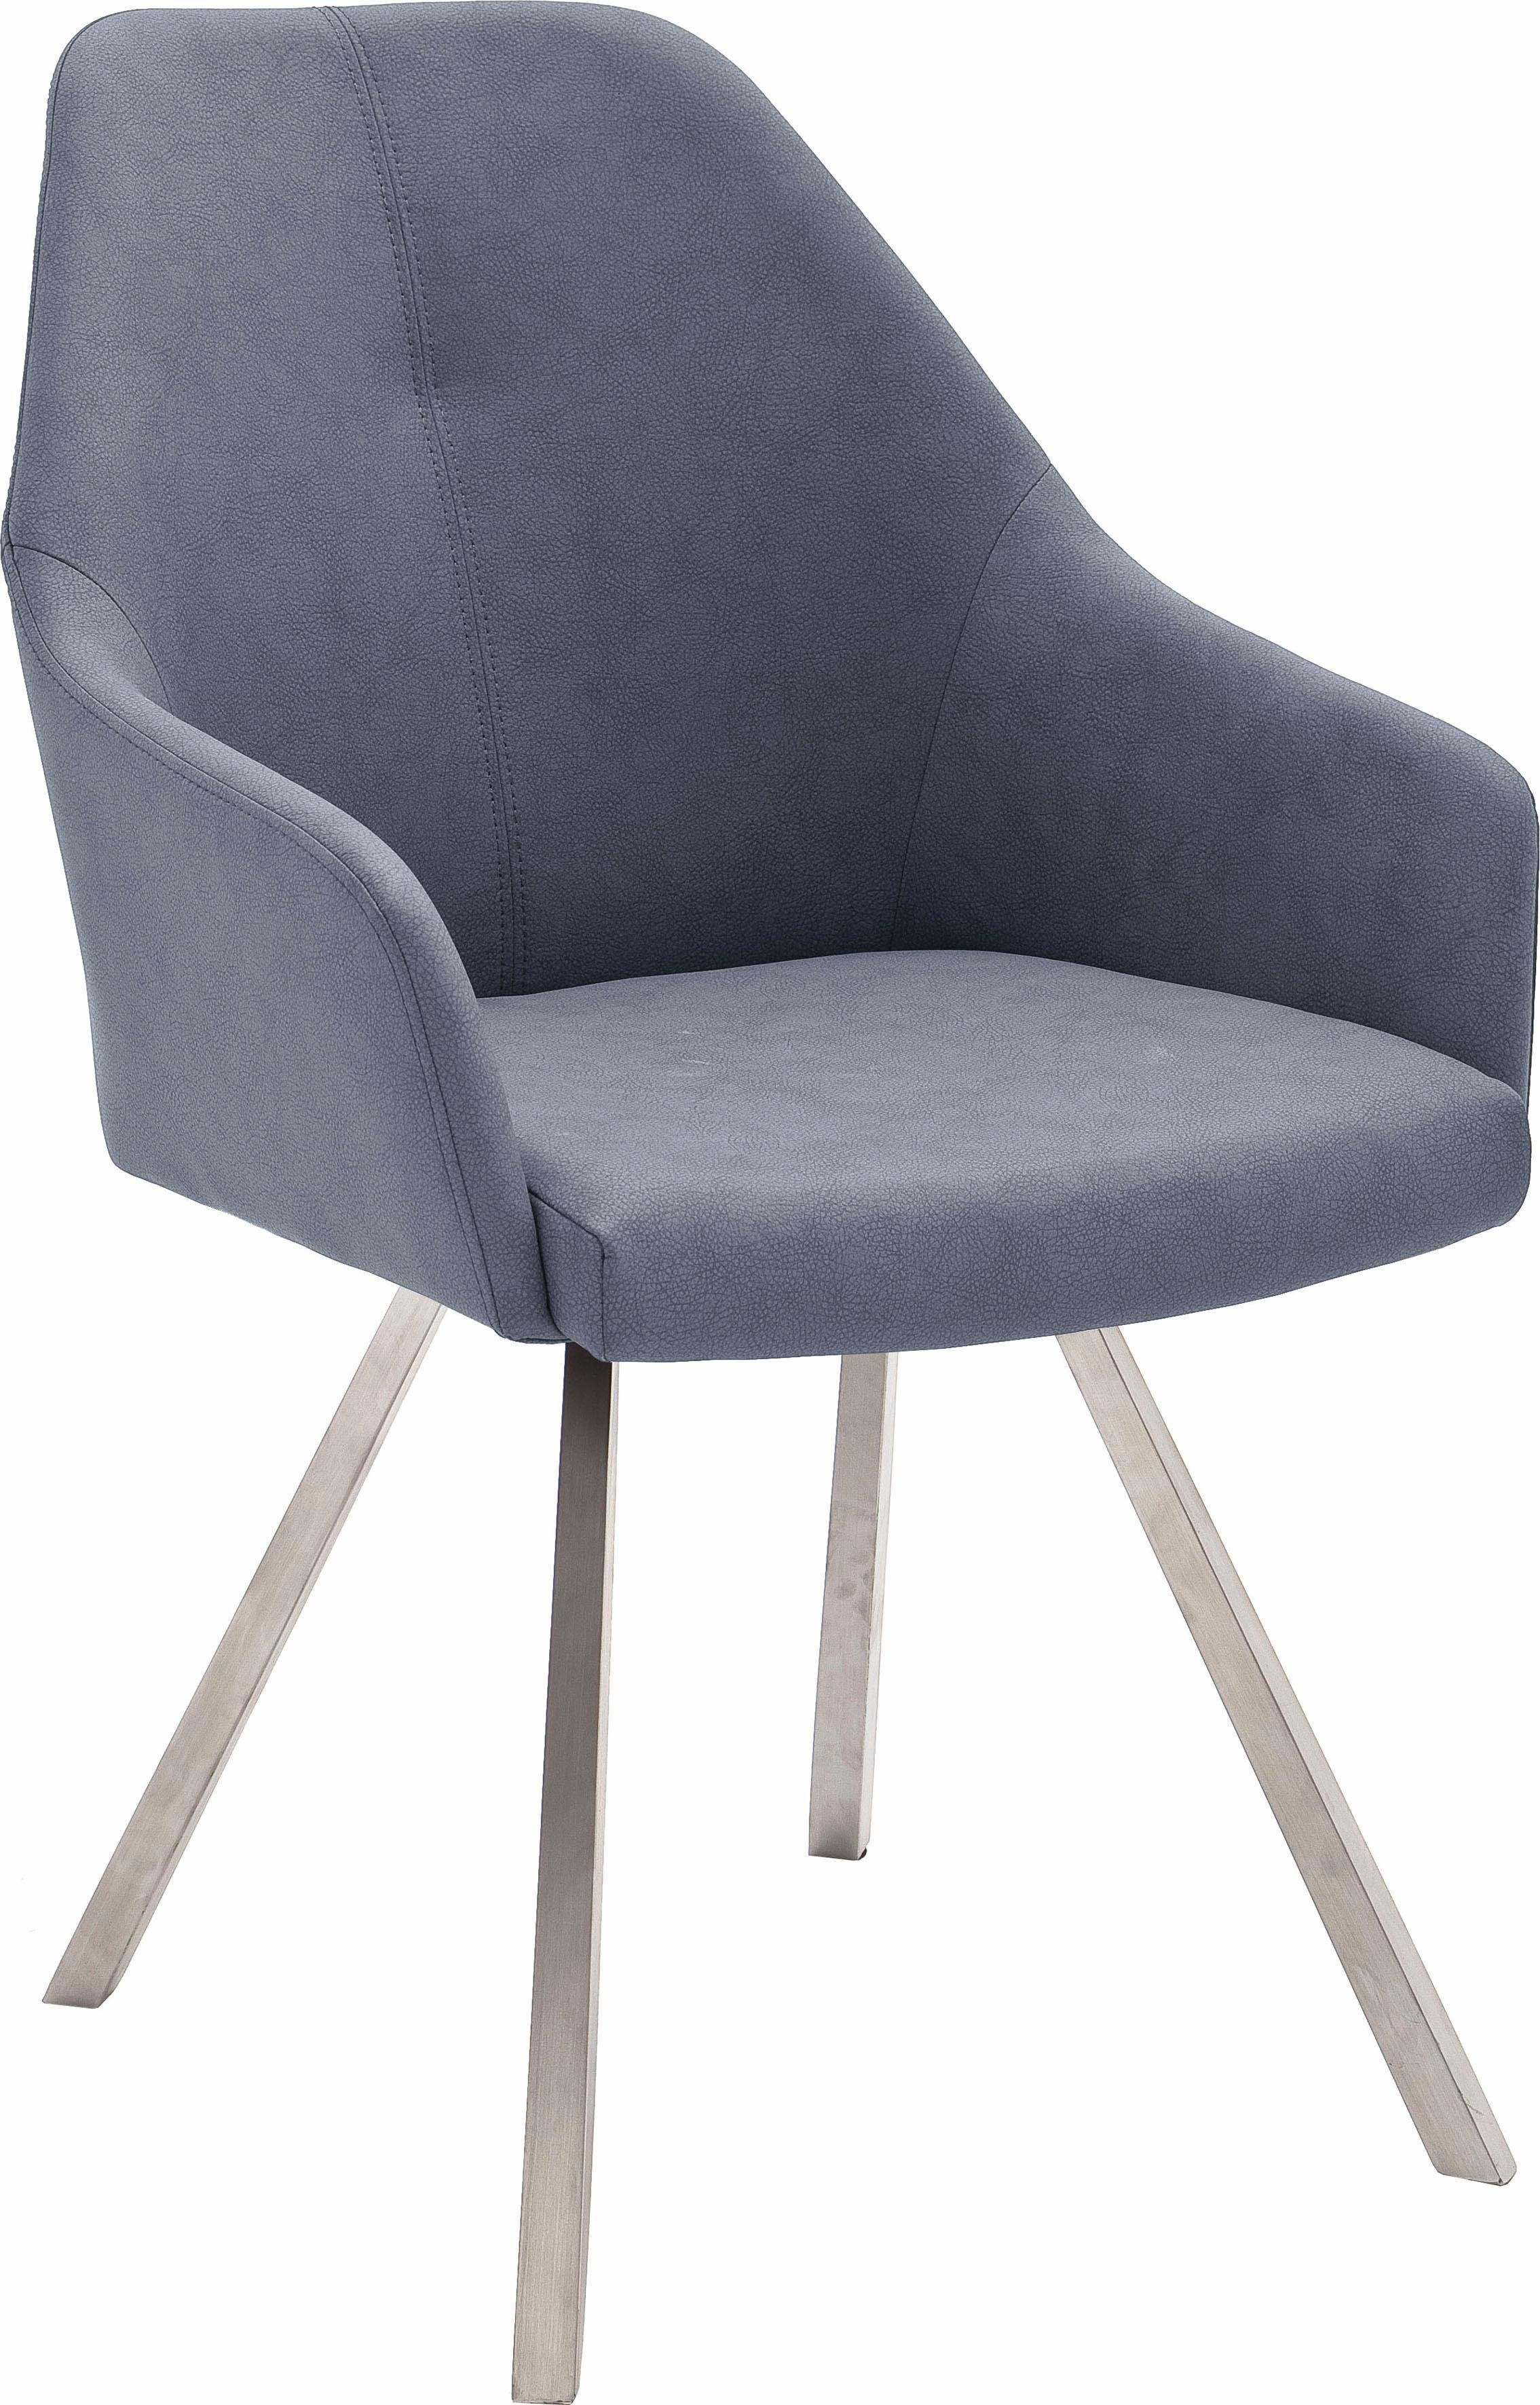 Stühle (2 Stück) blau, 4-Fuß Stuhl eckig, pflegeleichtes ...